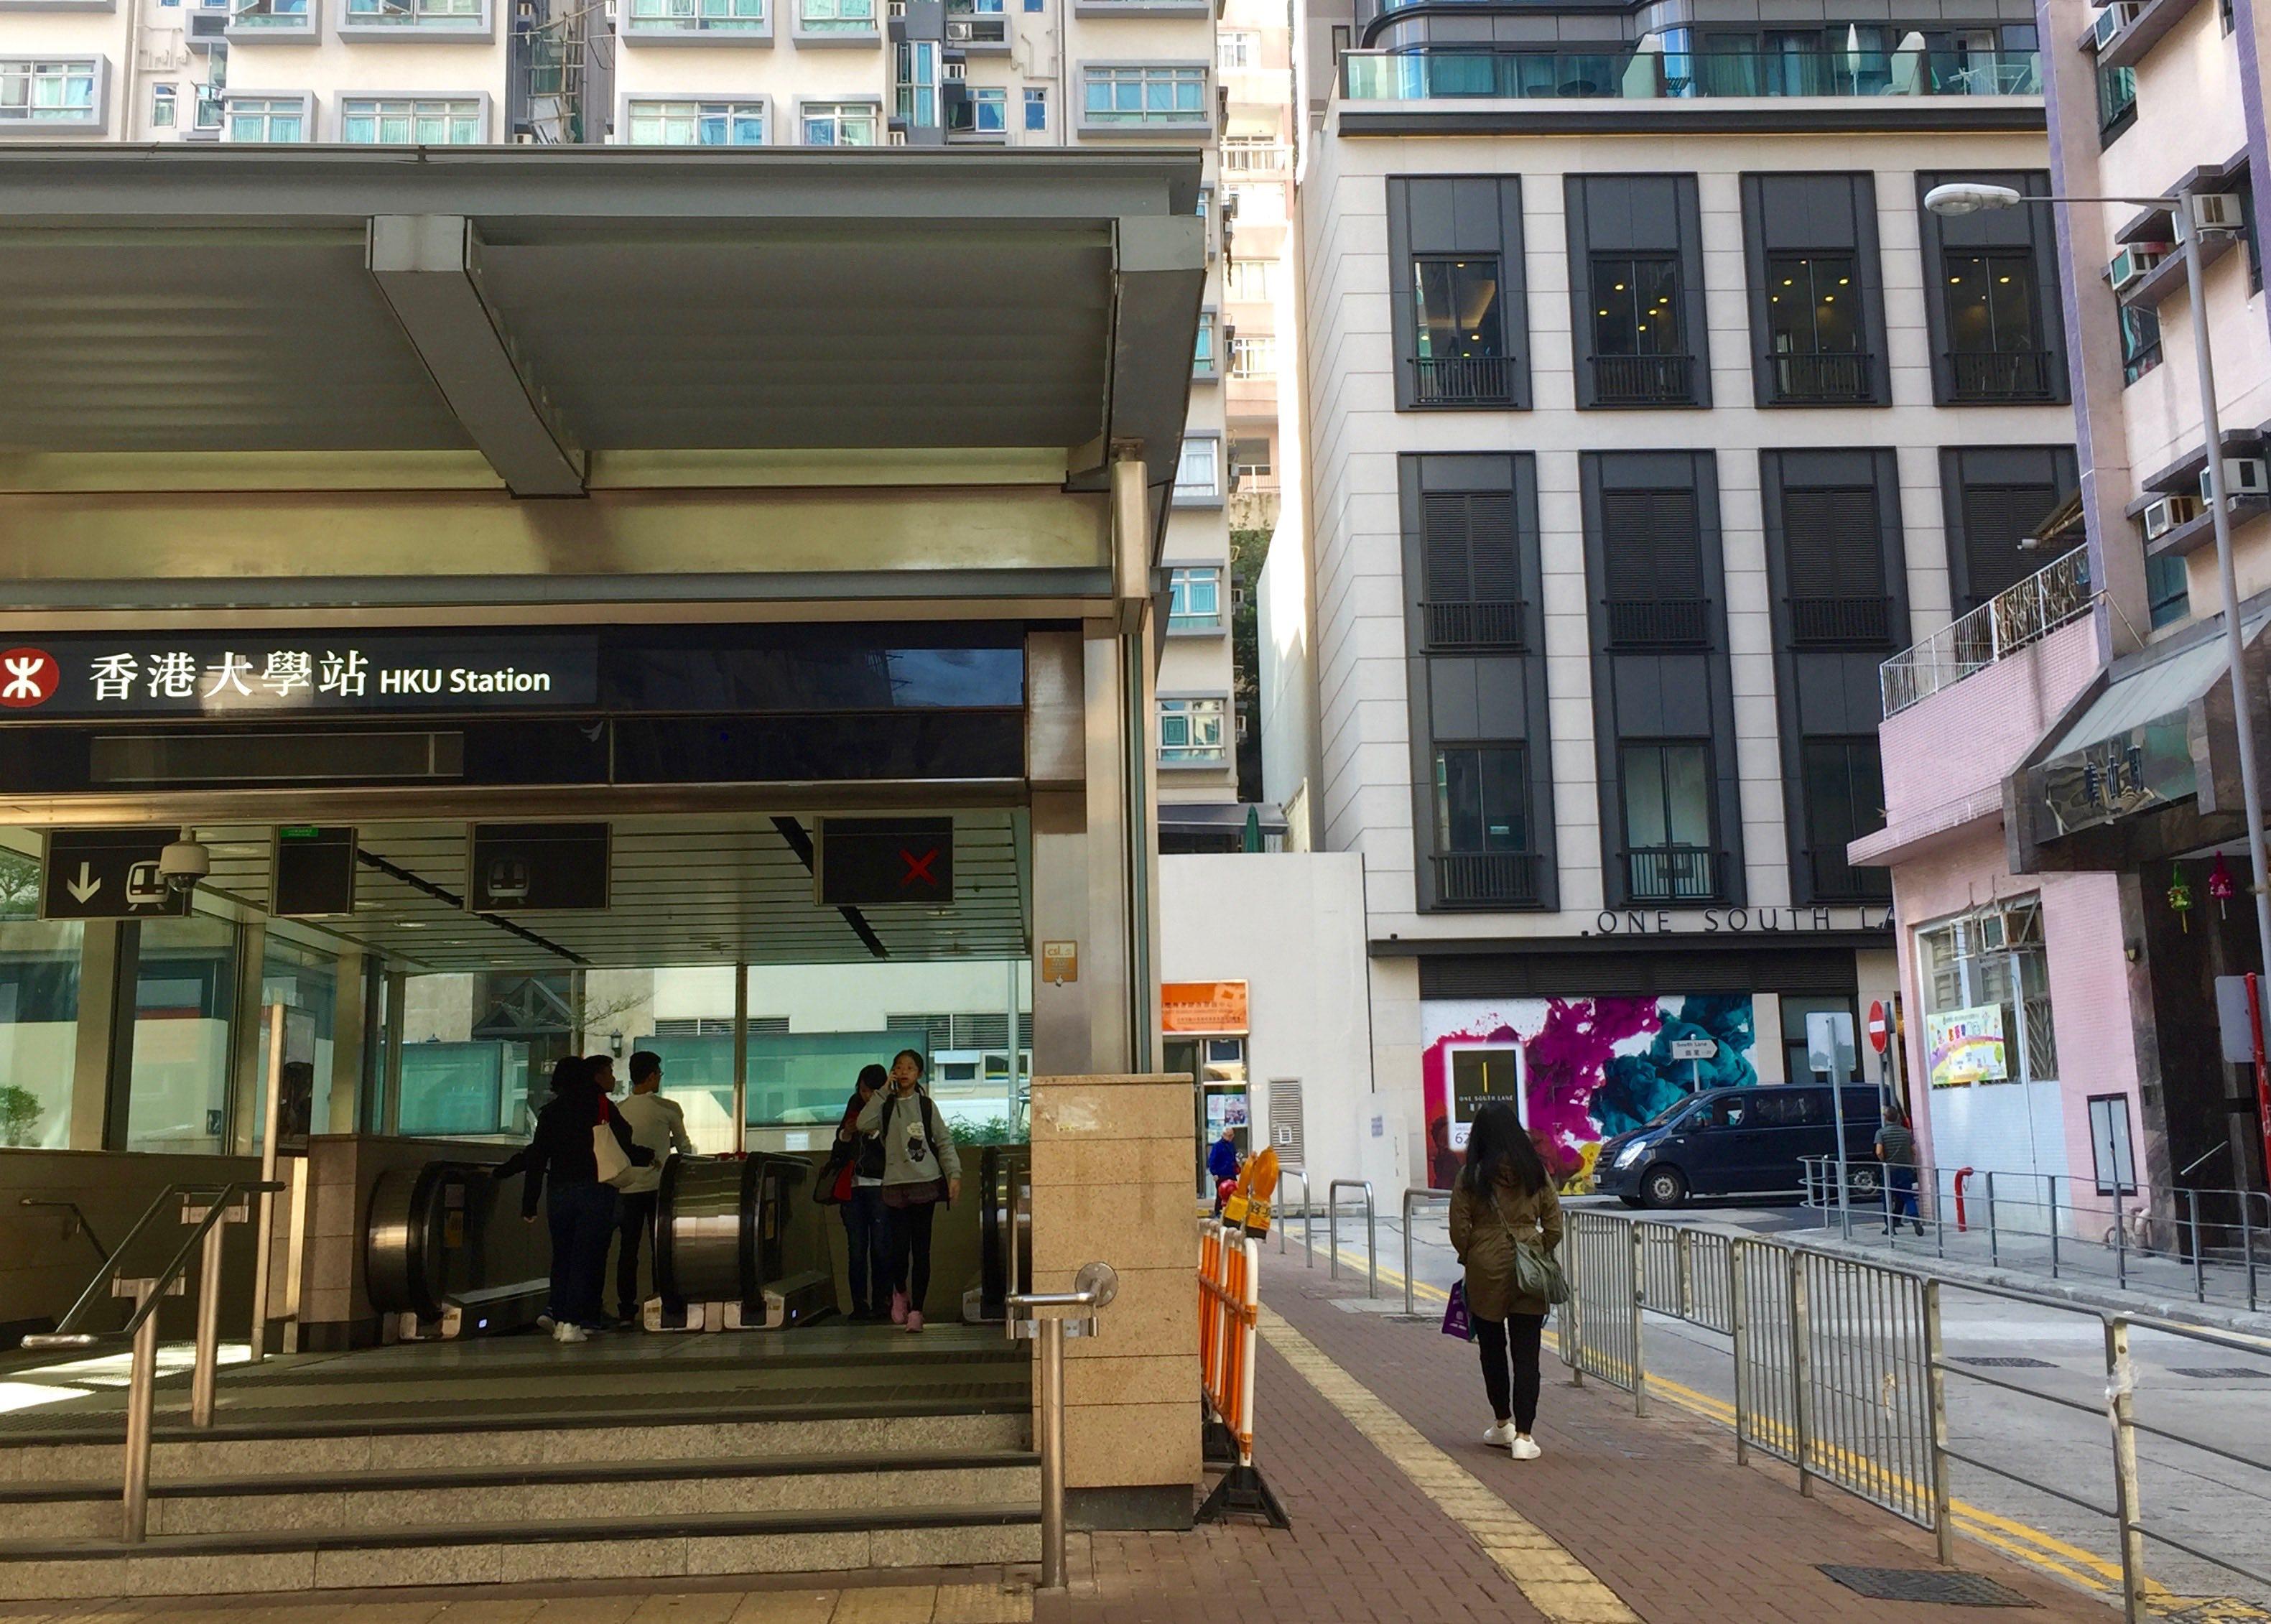 Hong Kong Sai Ying Pun minute-walk from MTR restaurant shop for rent